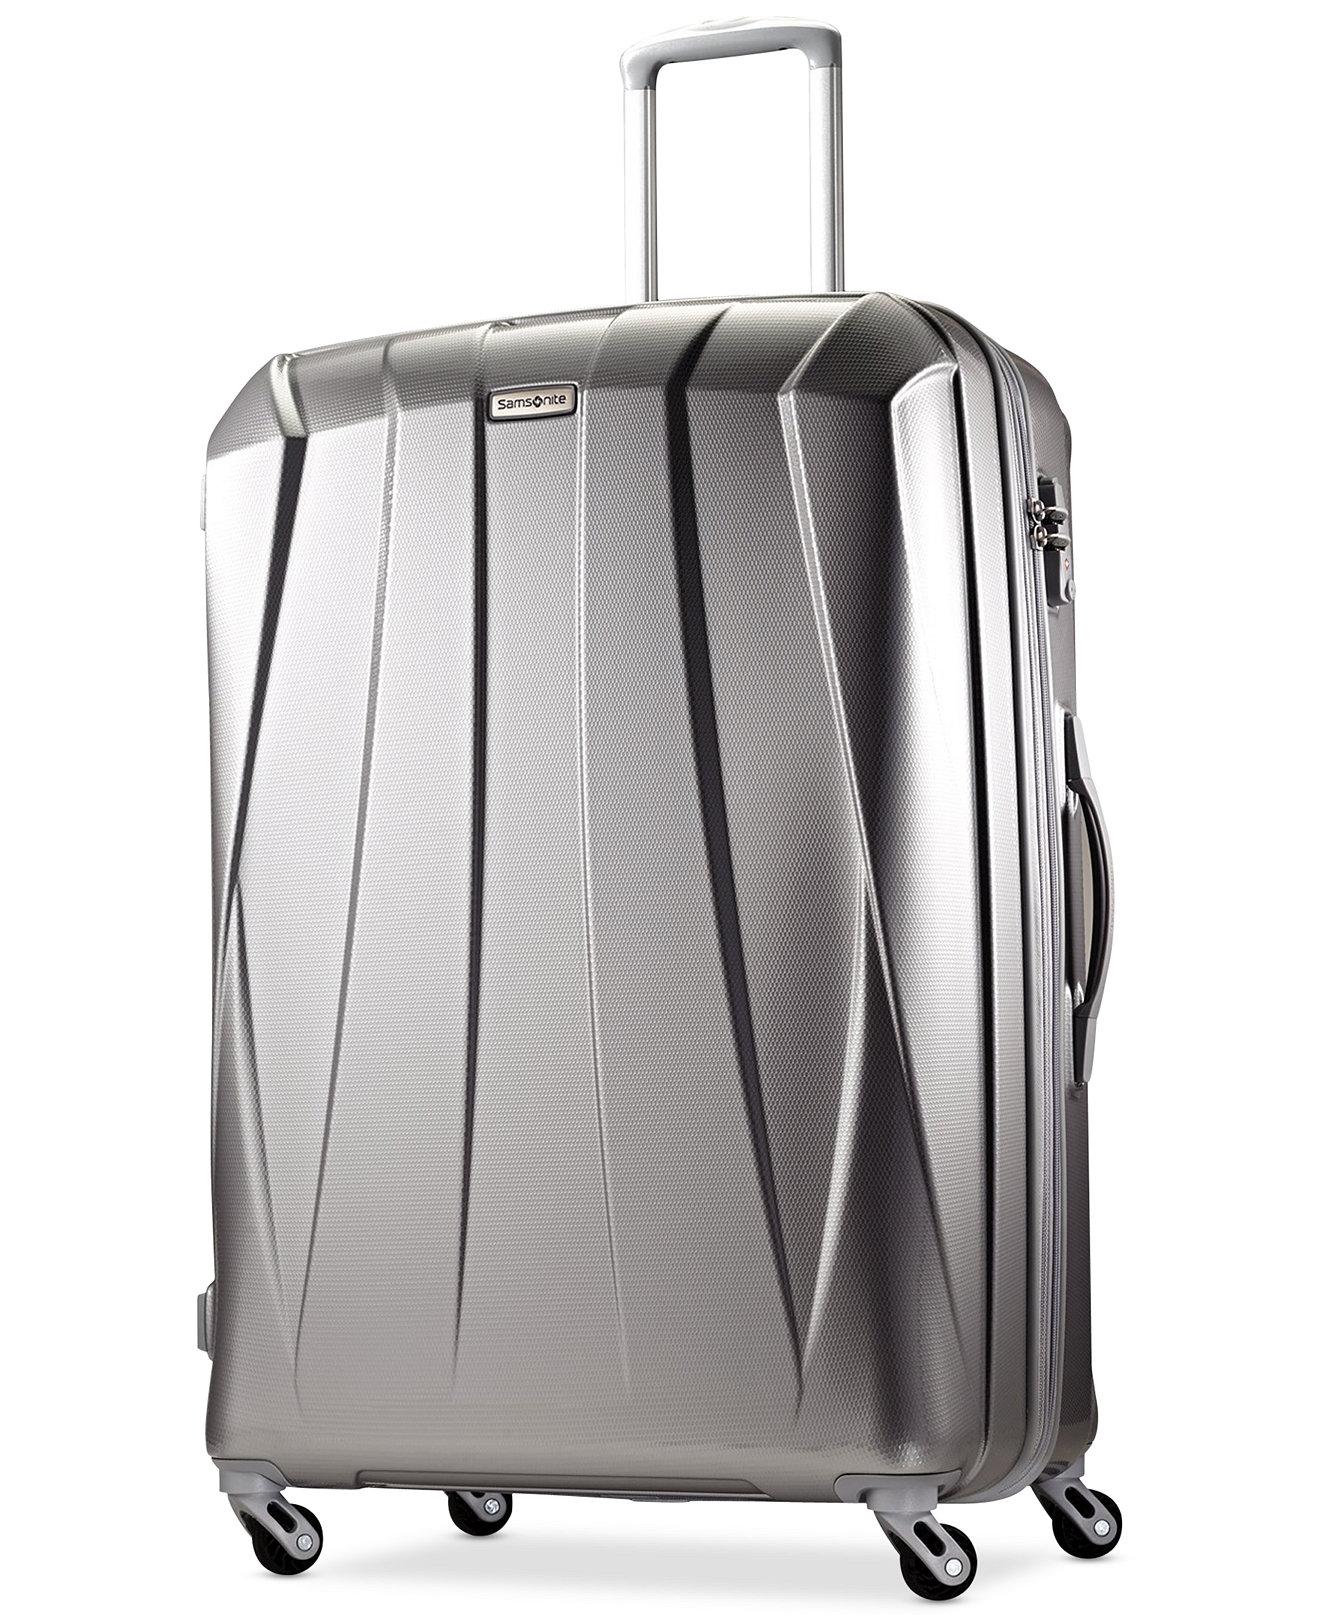 White apron macy's - Samsonite Vibratta 29 Hardside Spinner Suitcase Only At Macy S